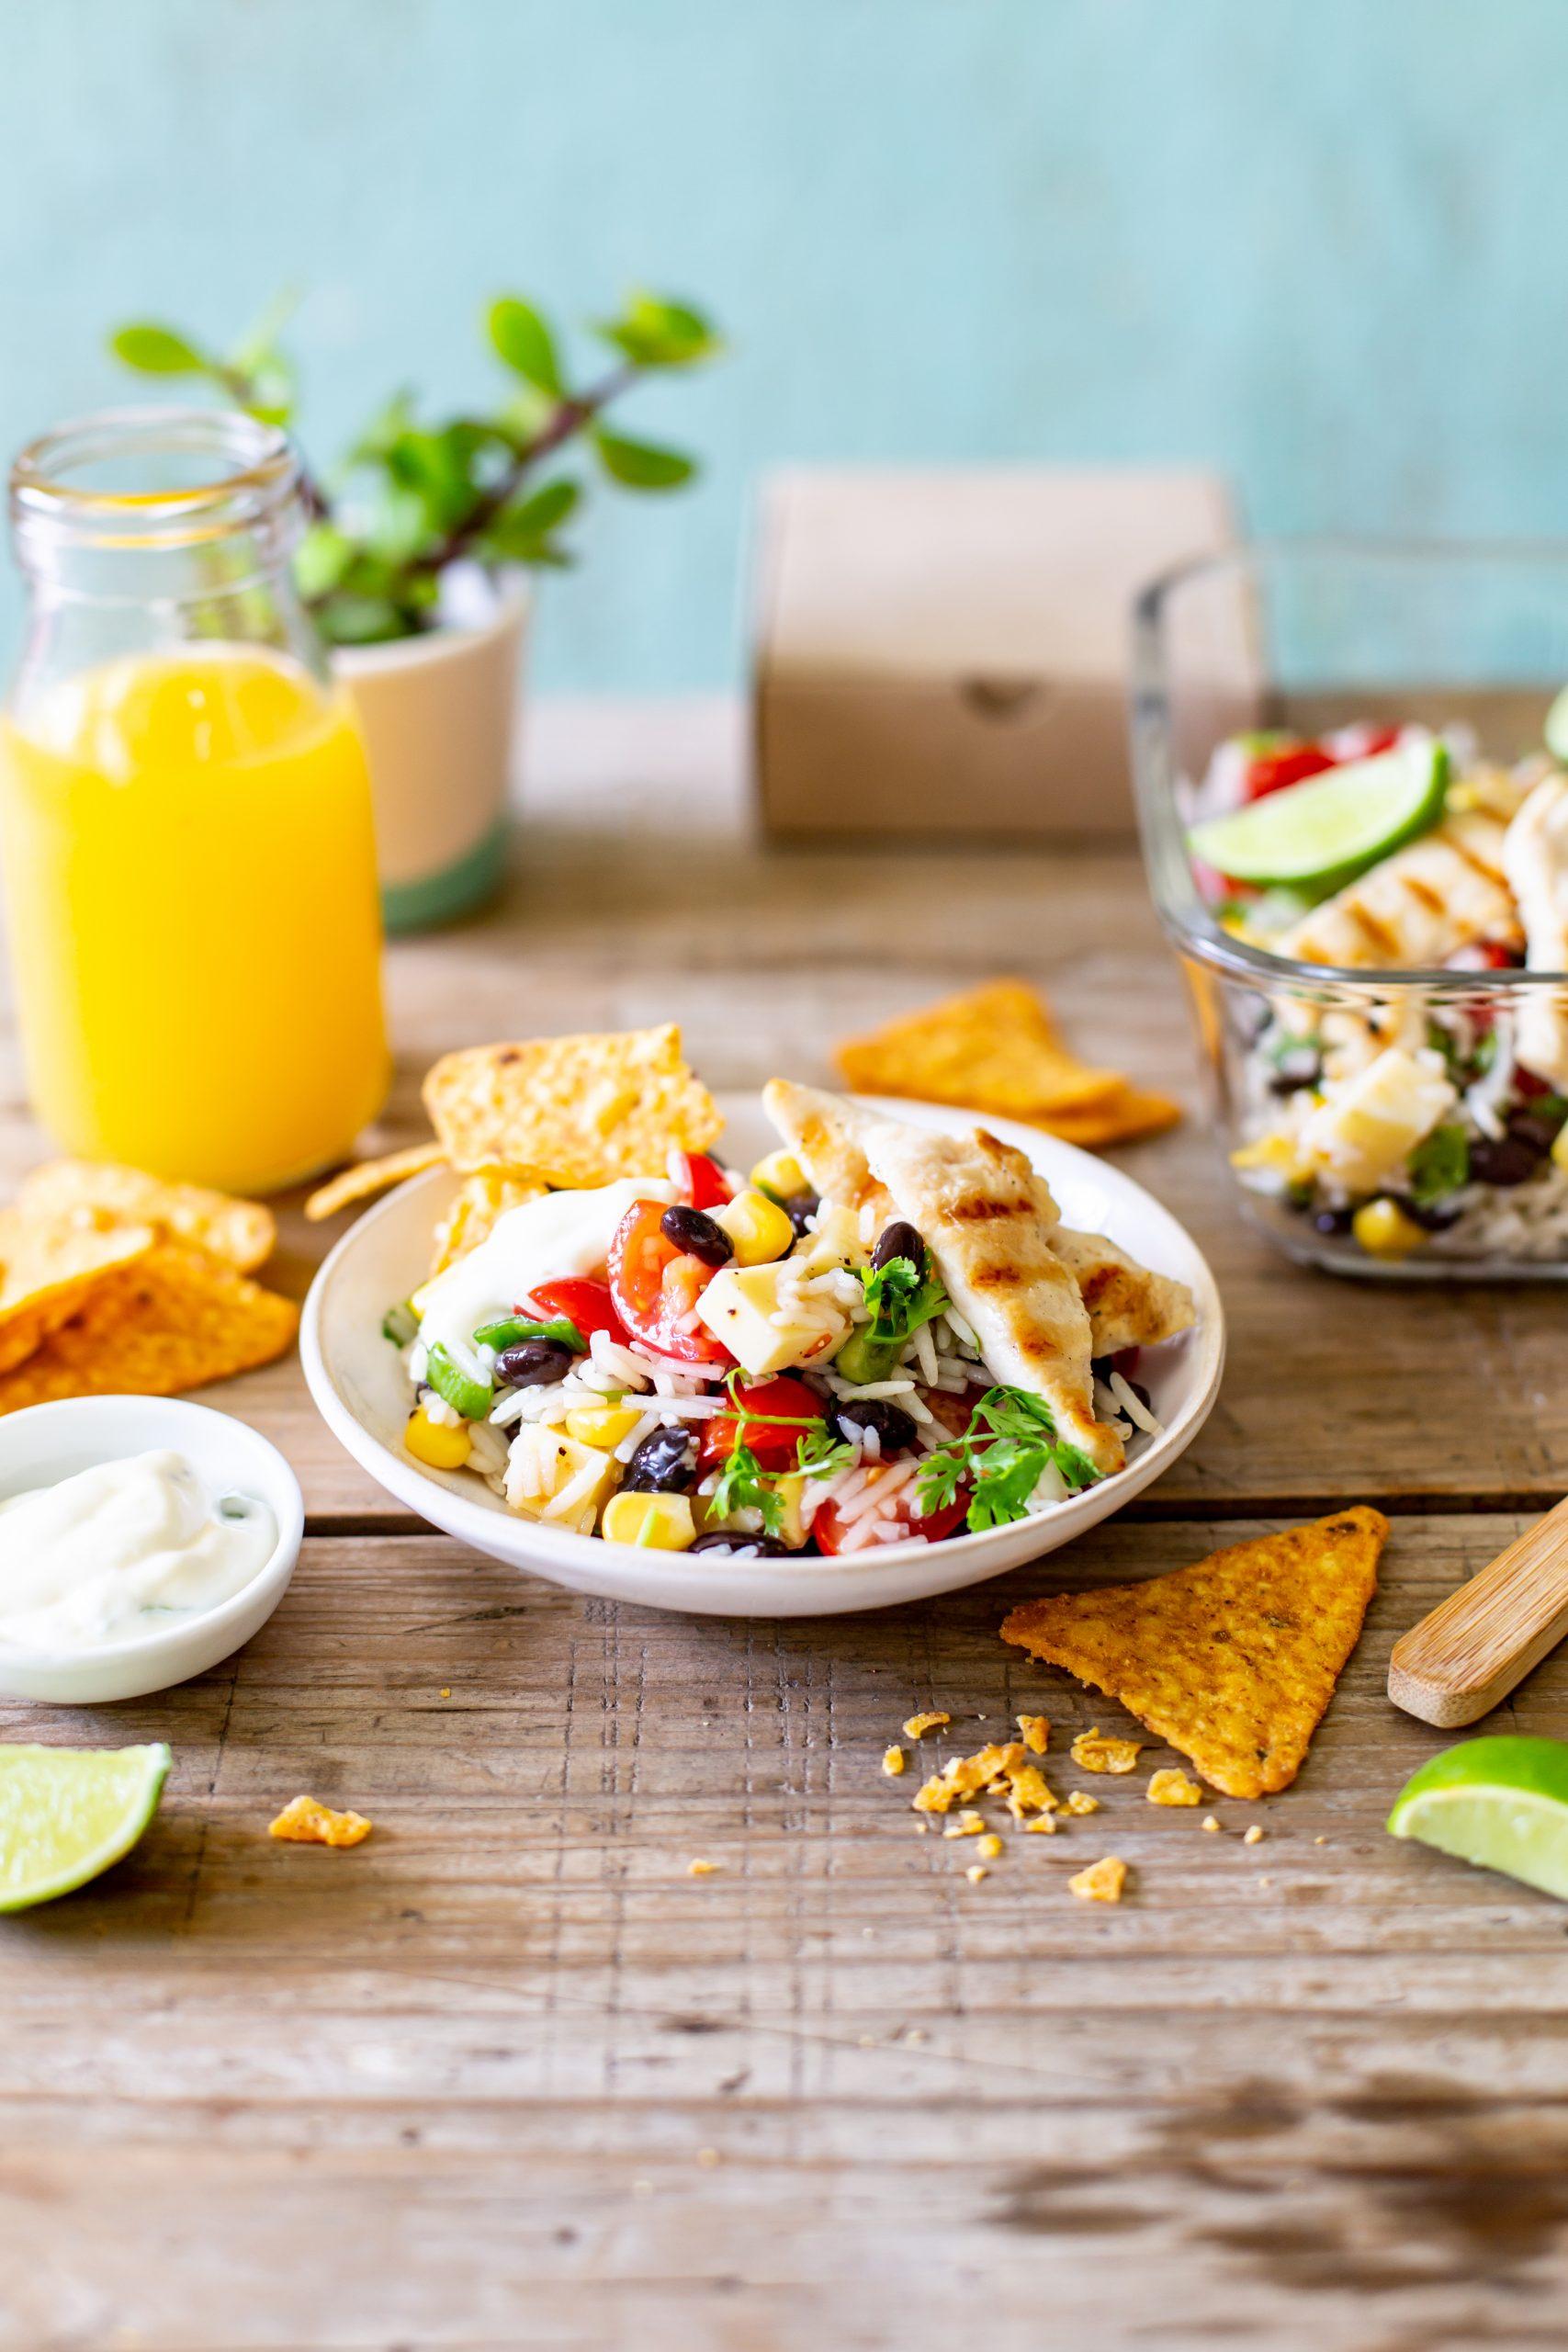 Crispy nacho salad